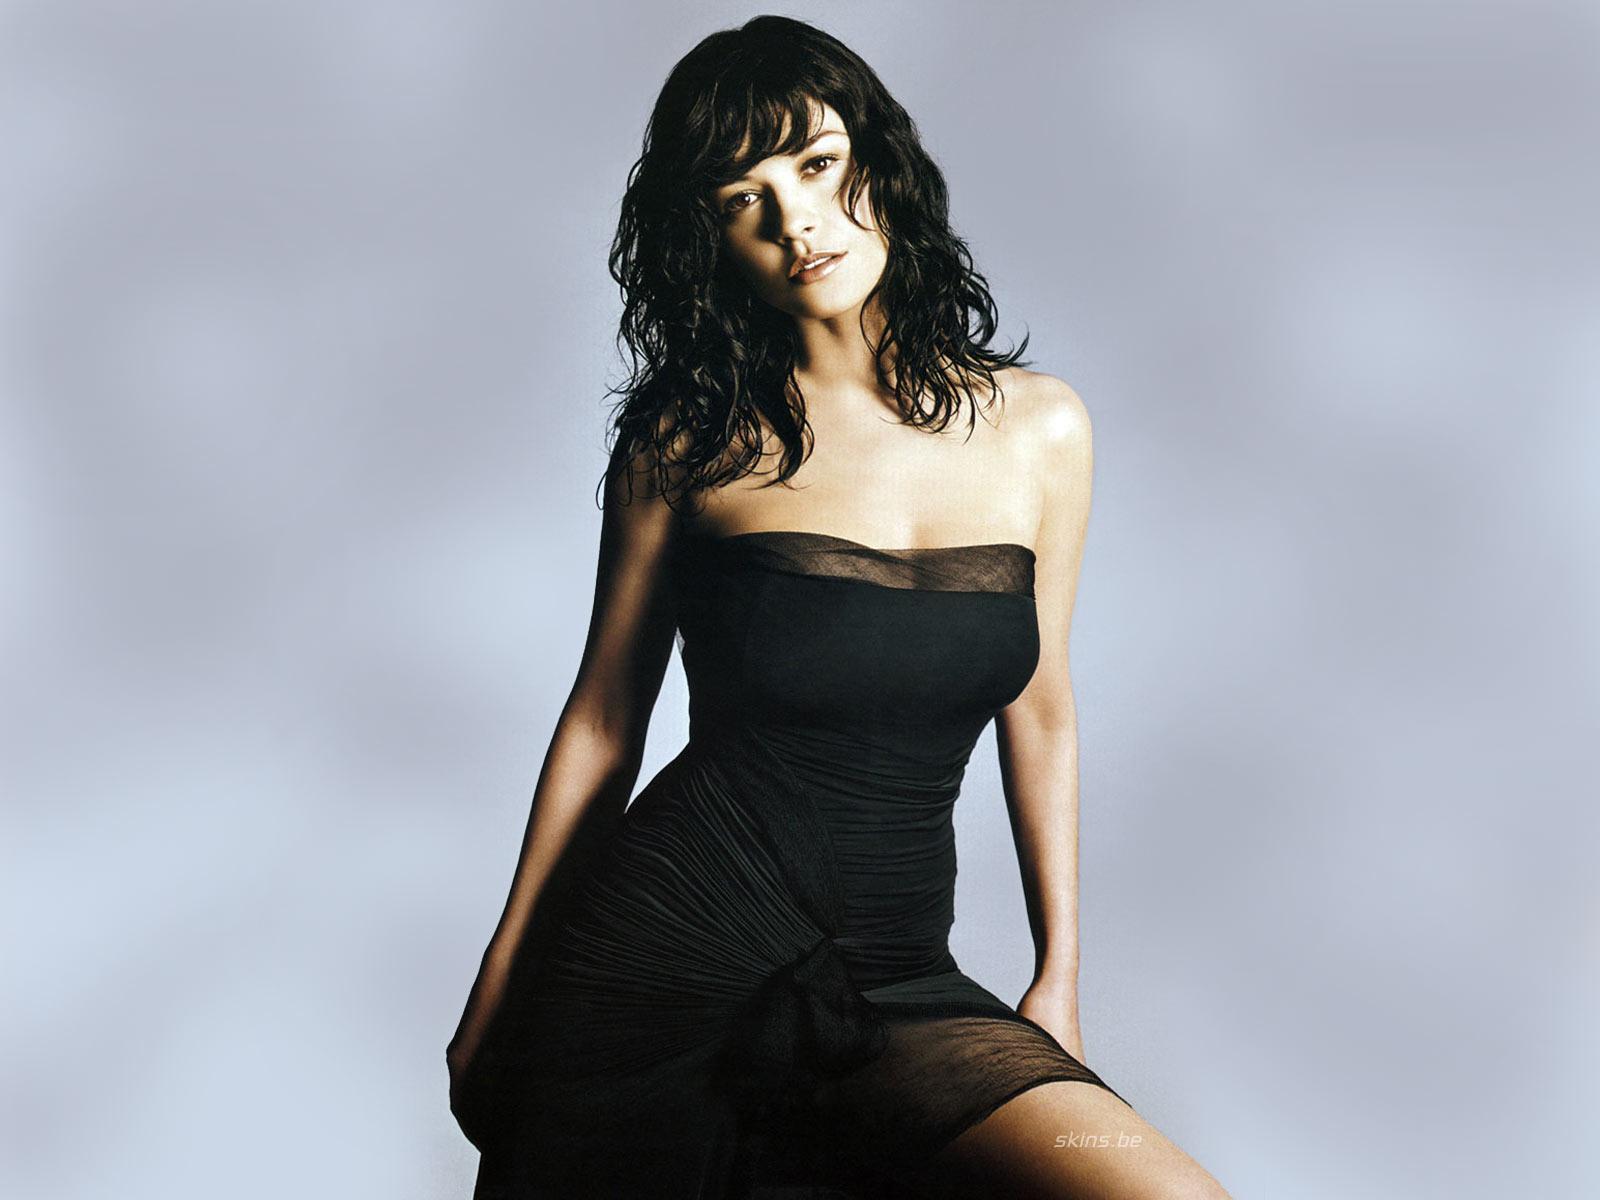 http://1.bp.blogspot.com/_cWyMIJyi6Fc/TMcb9lSXuOI/AAAAAAAADME/zchY_DM0wwA/s1600/Catherine+Zeta-Jones_1.jpg